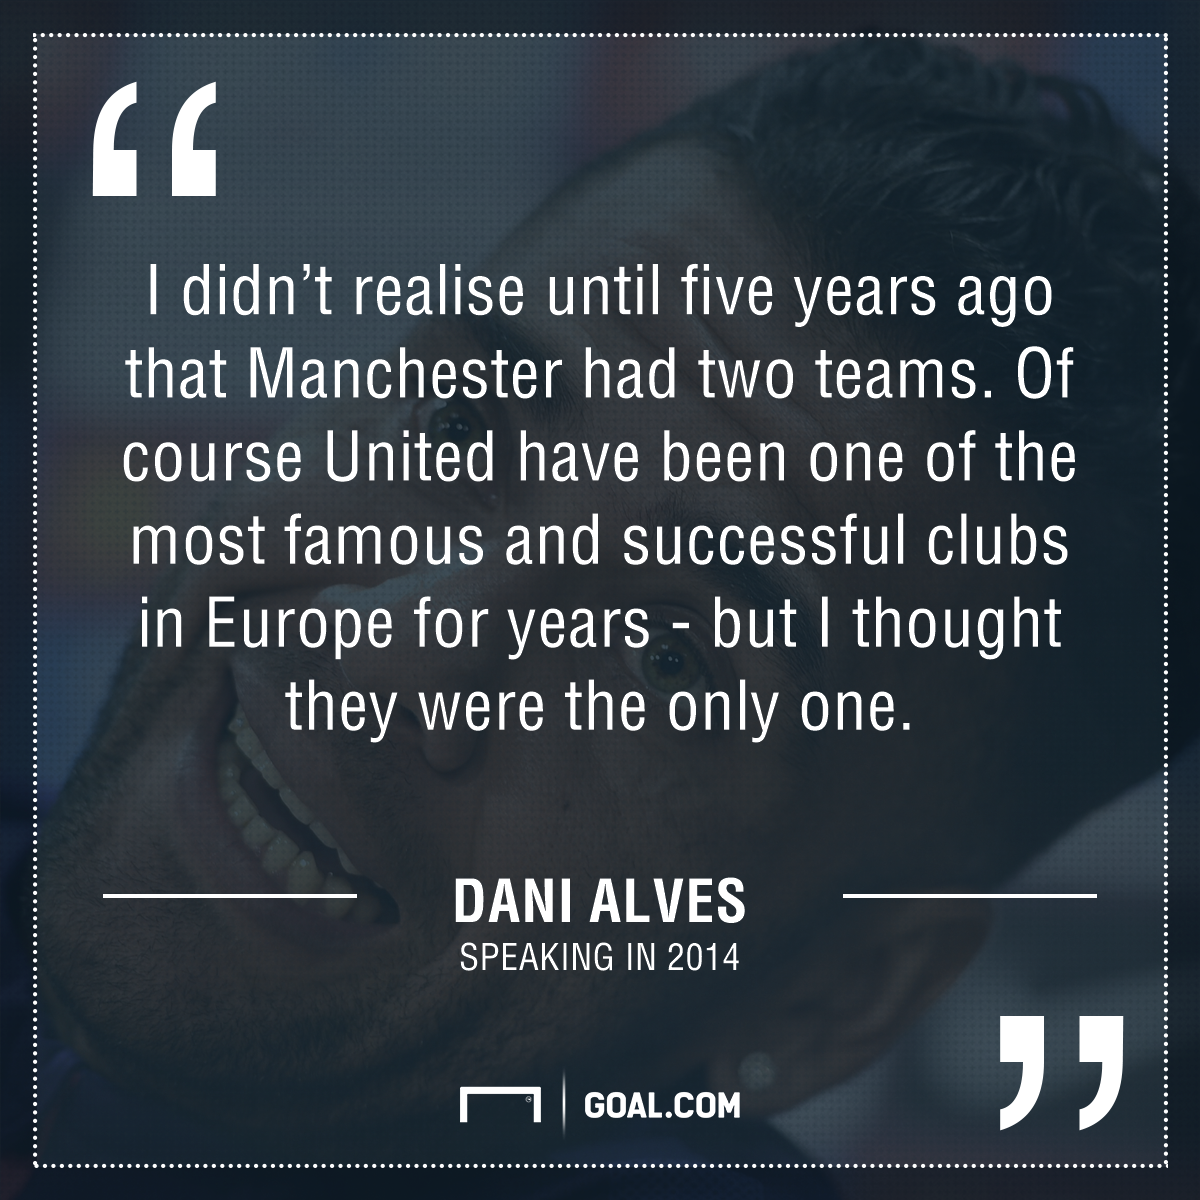 Dani Alves quote